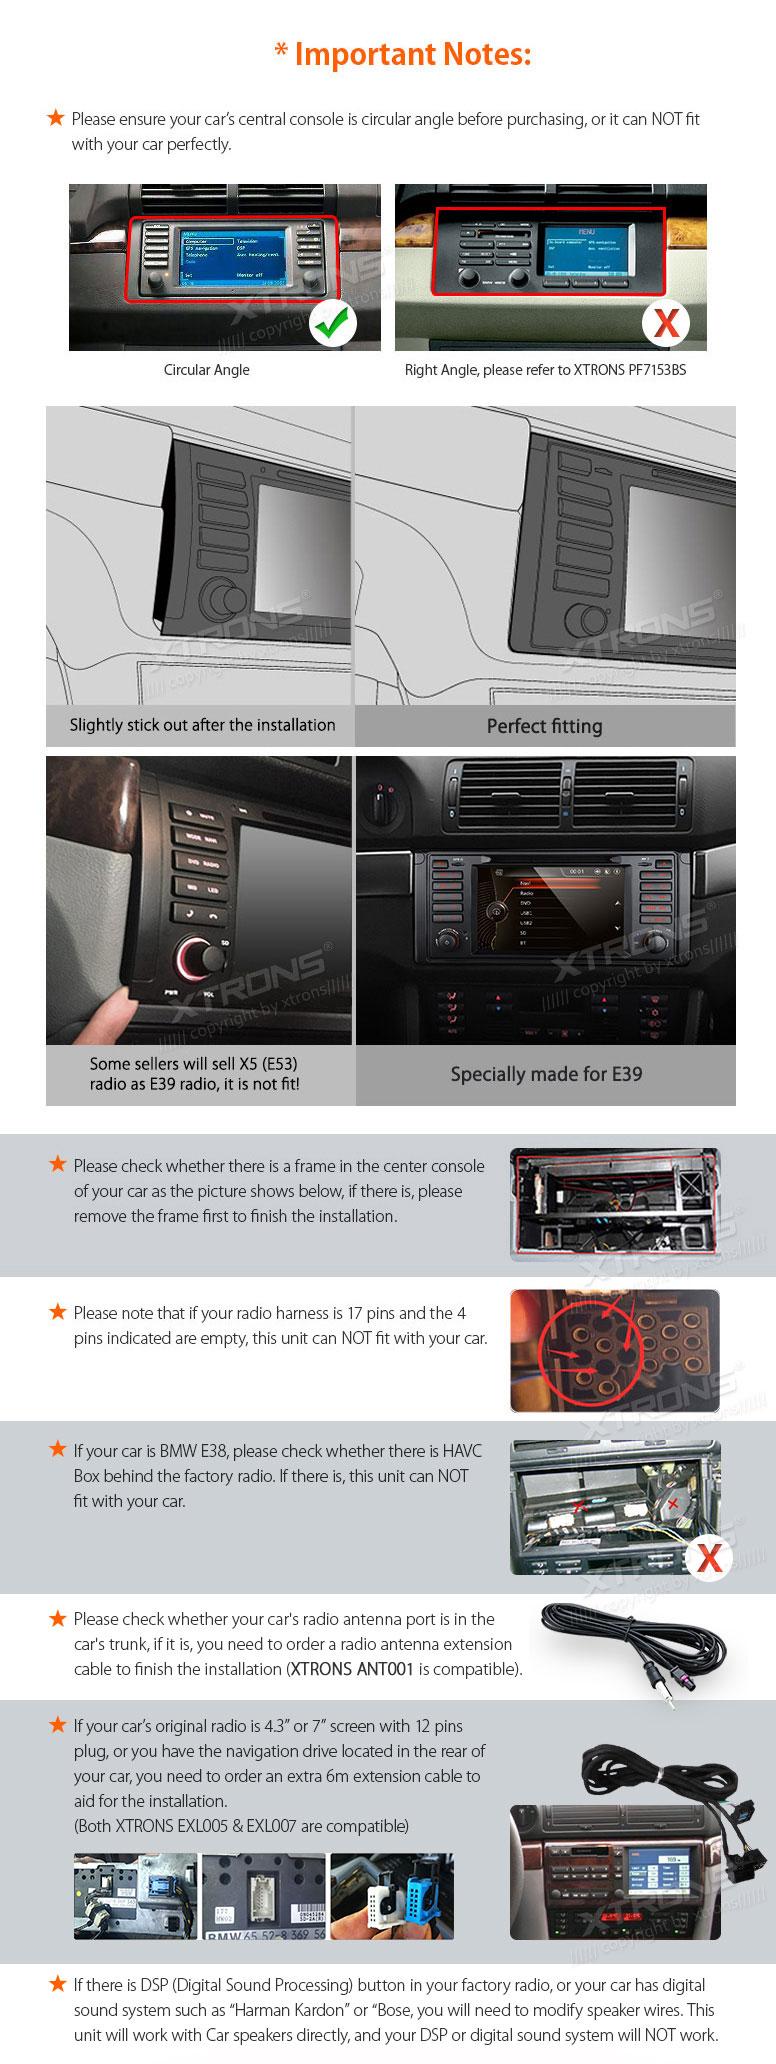 New Philips Radio Amp Wiring Diagram E on